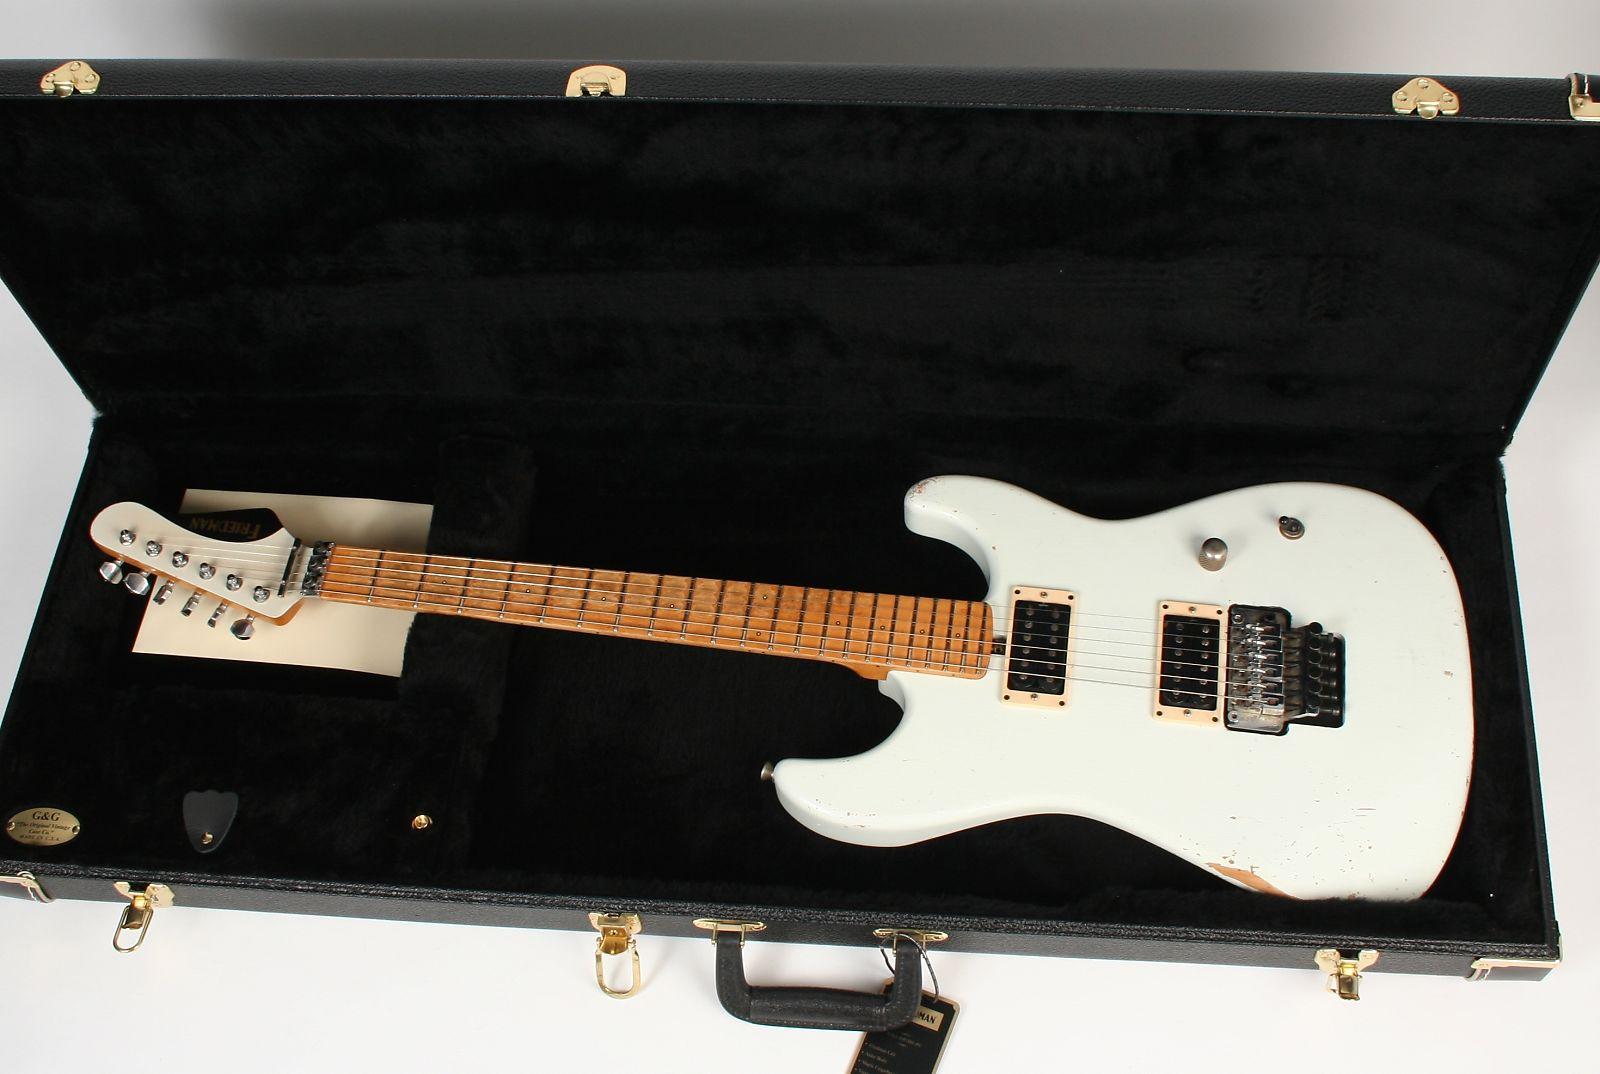 Friedman Cali New Vintage White Guitar Electronics Dstevensdesign